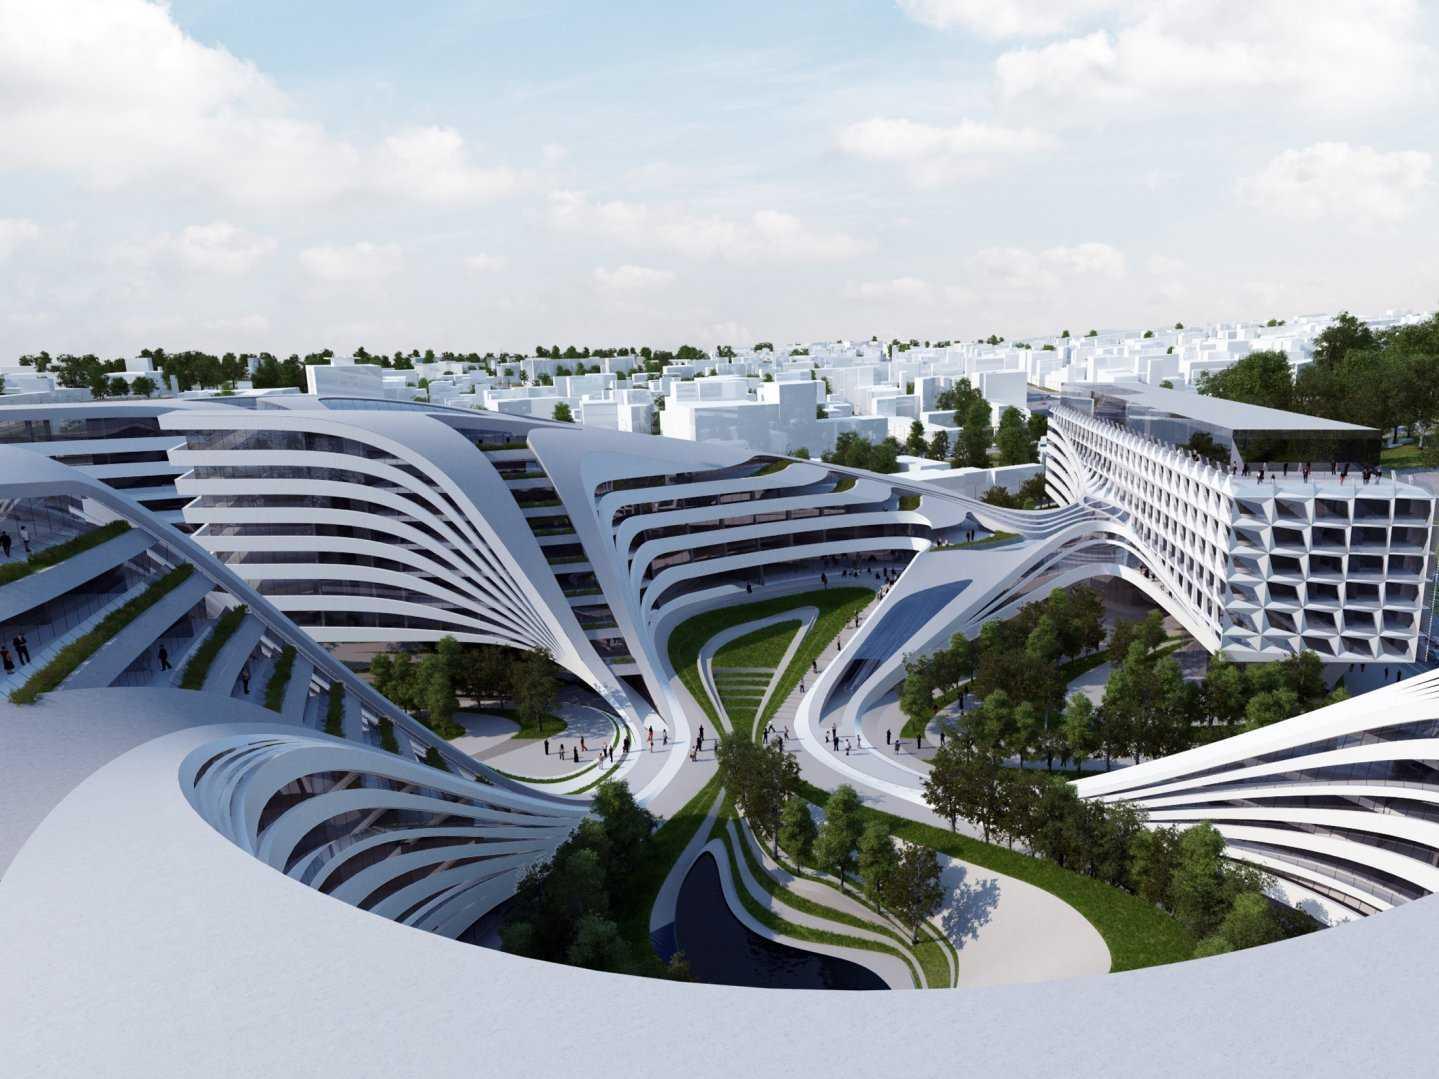 Zaha Hadid Design Concepts And Theory the daily glean: guest post: zaha hadid's architectural wonders